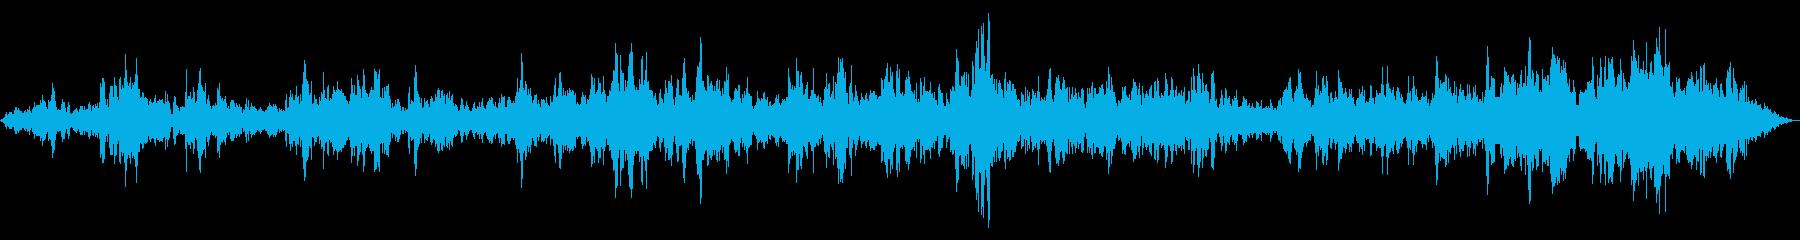 HUM OF VOICES、レスト...の再生済みの波形